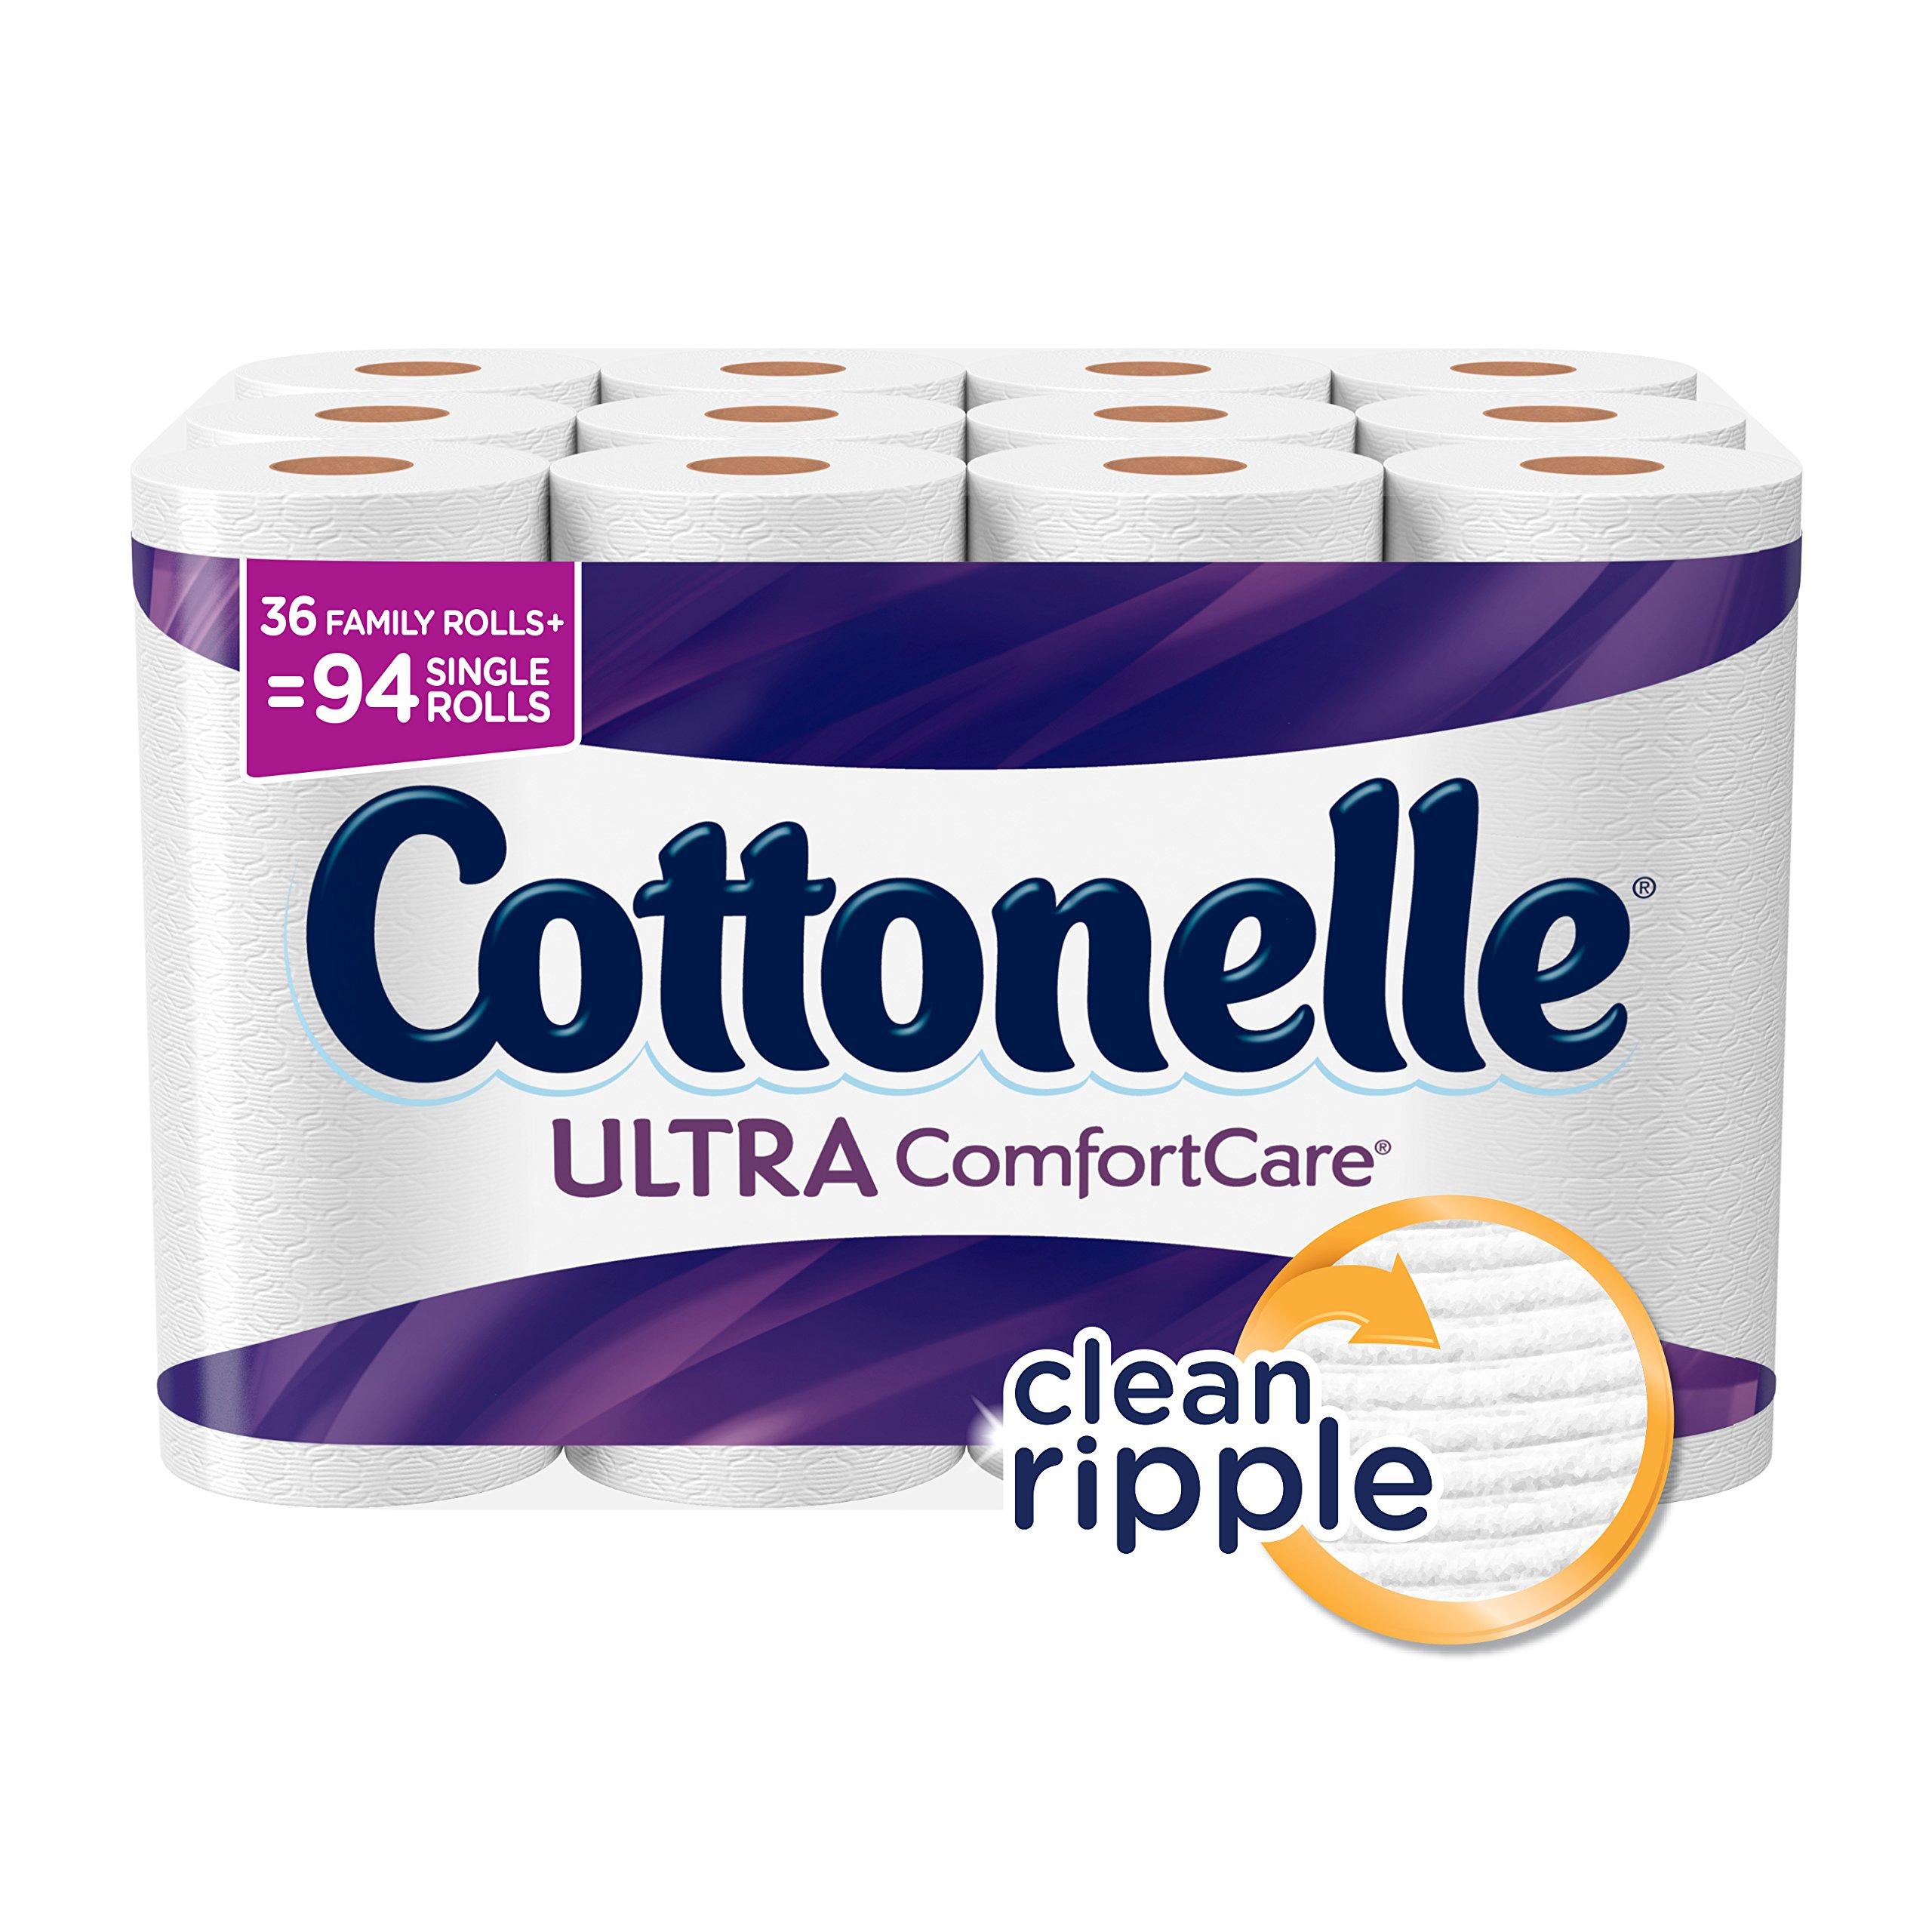 Cottonelle Ultra Comfort Family Roll Toilet Paper, Bath Tissue, 36 Toilet Paper Rolls